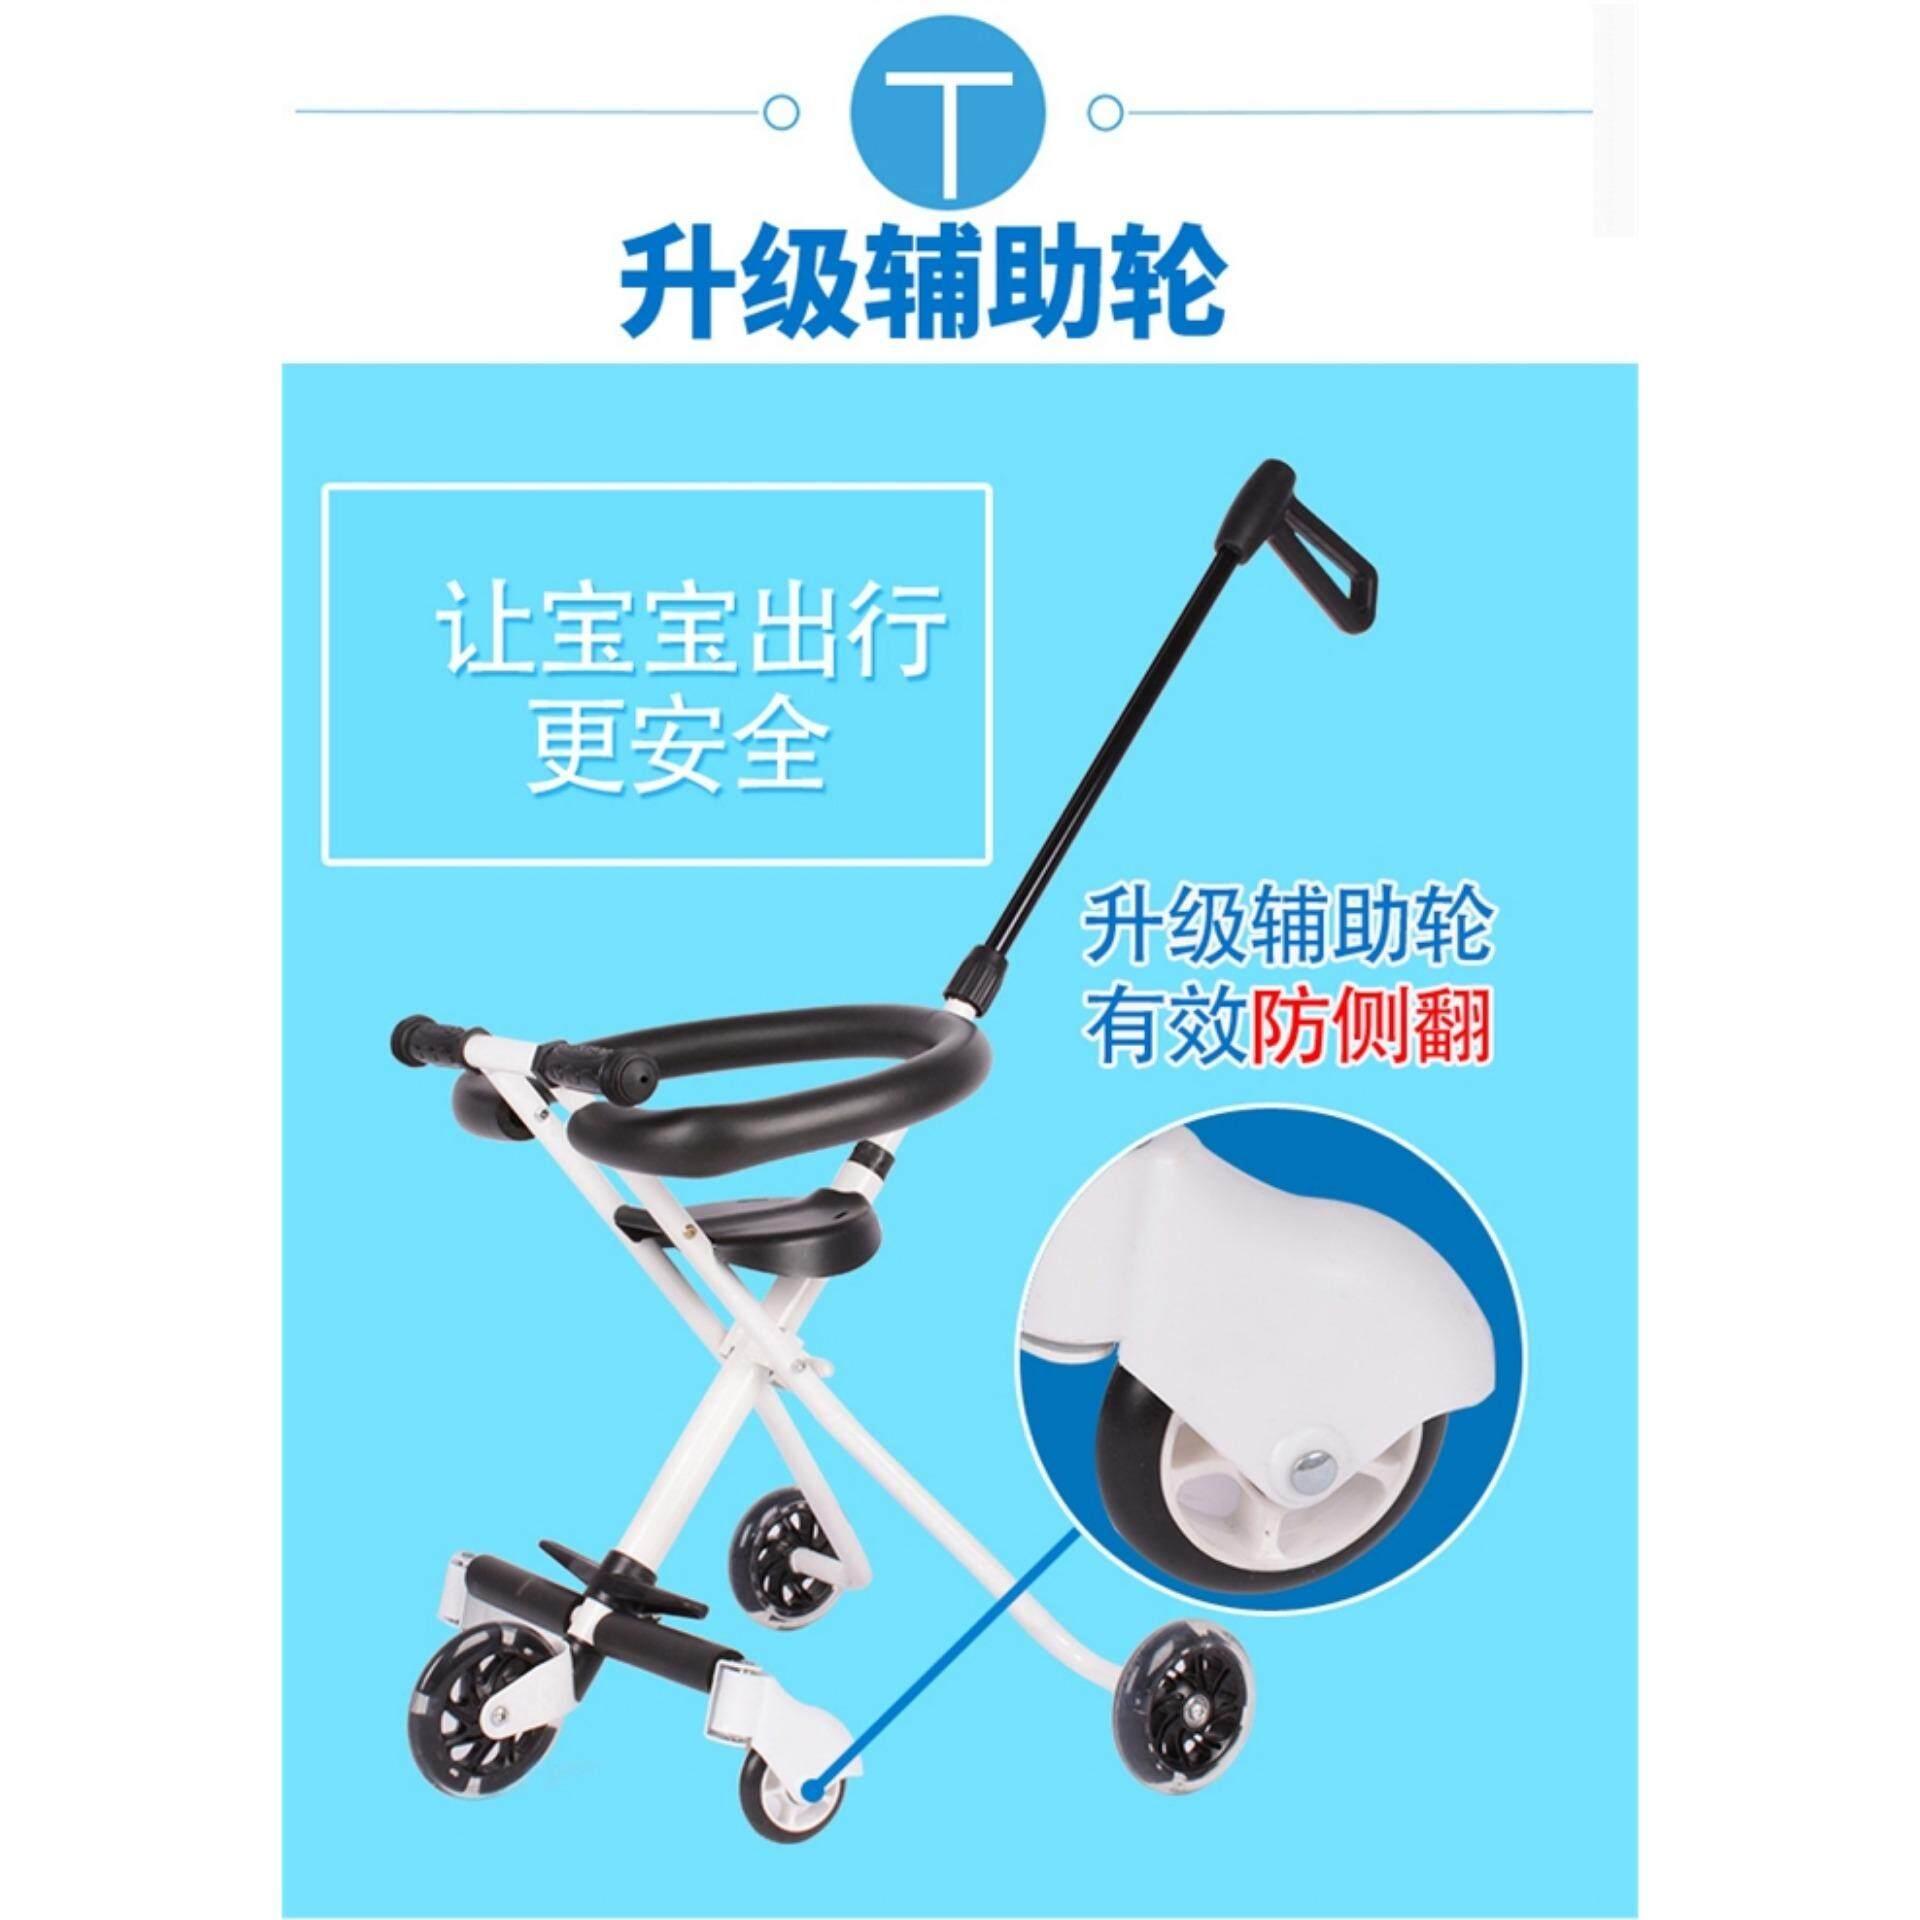 Magic strollers coupon code